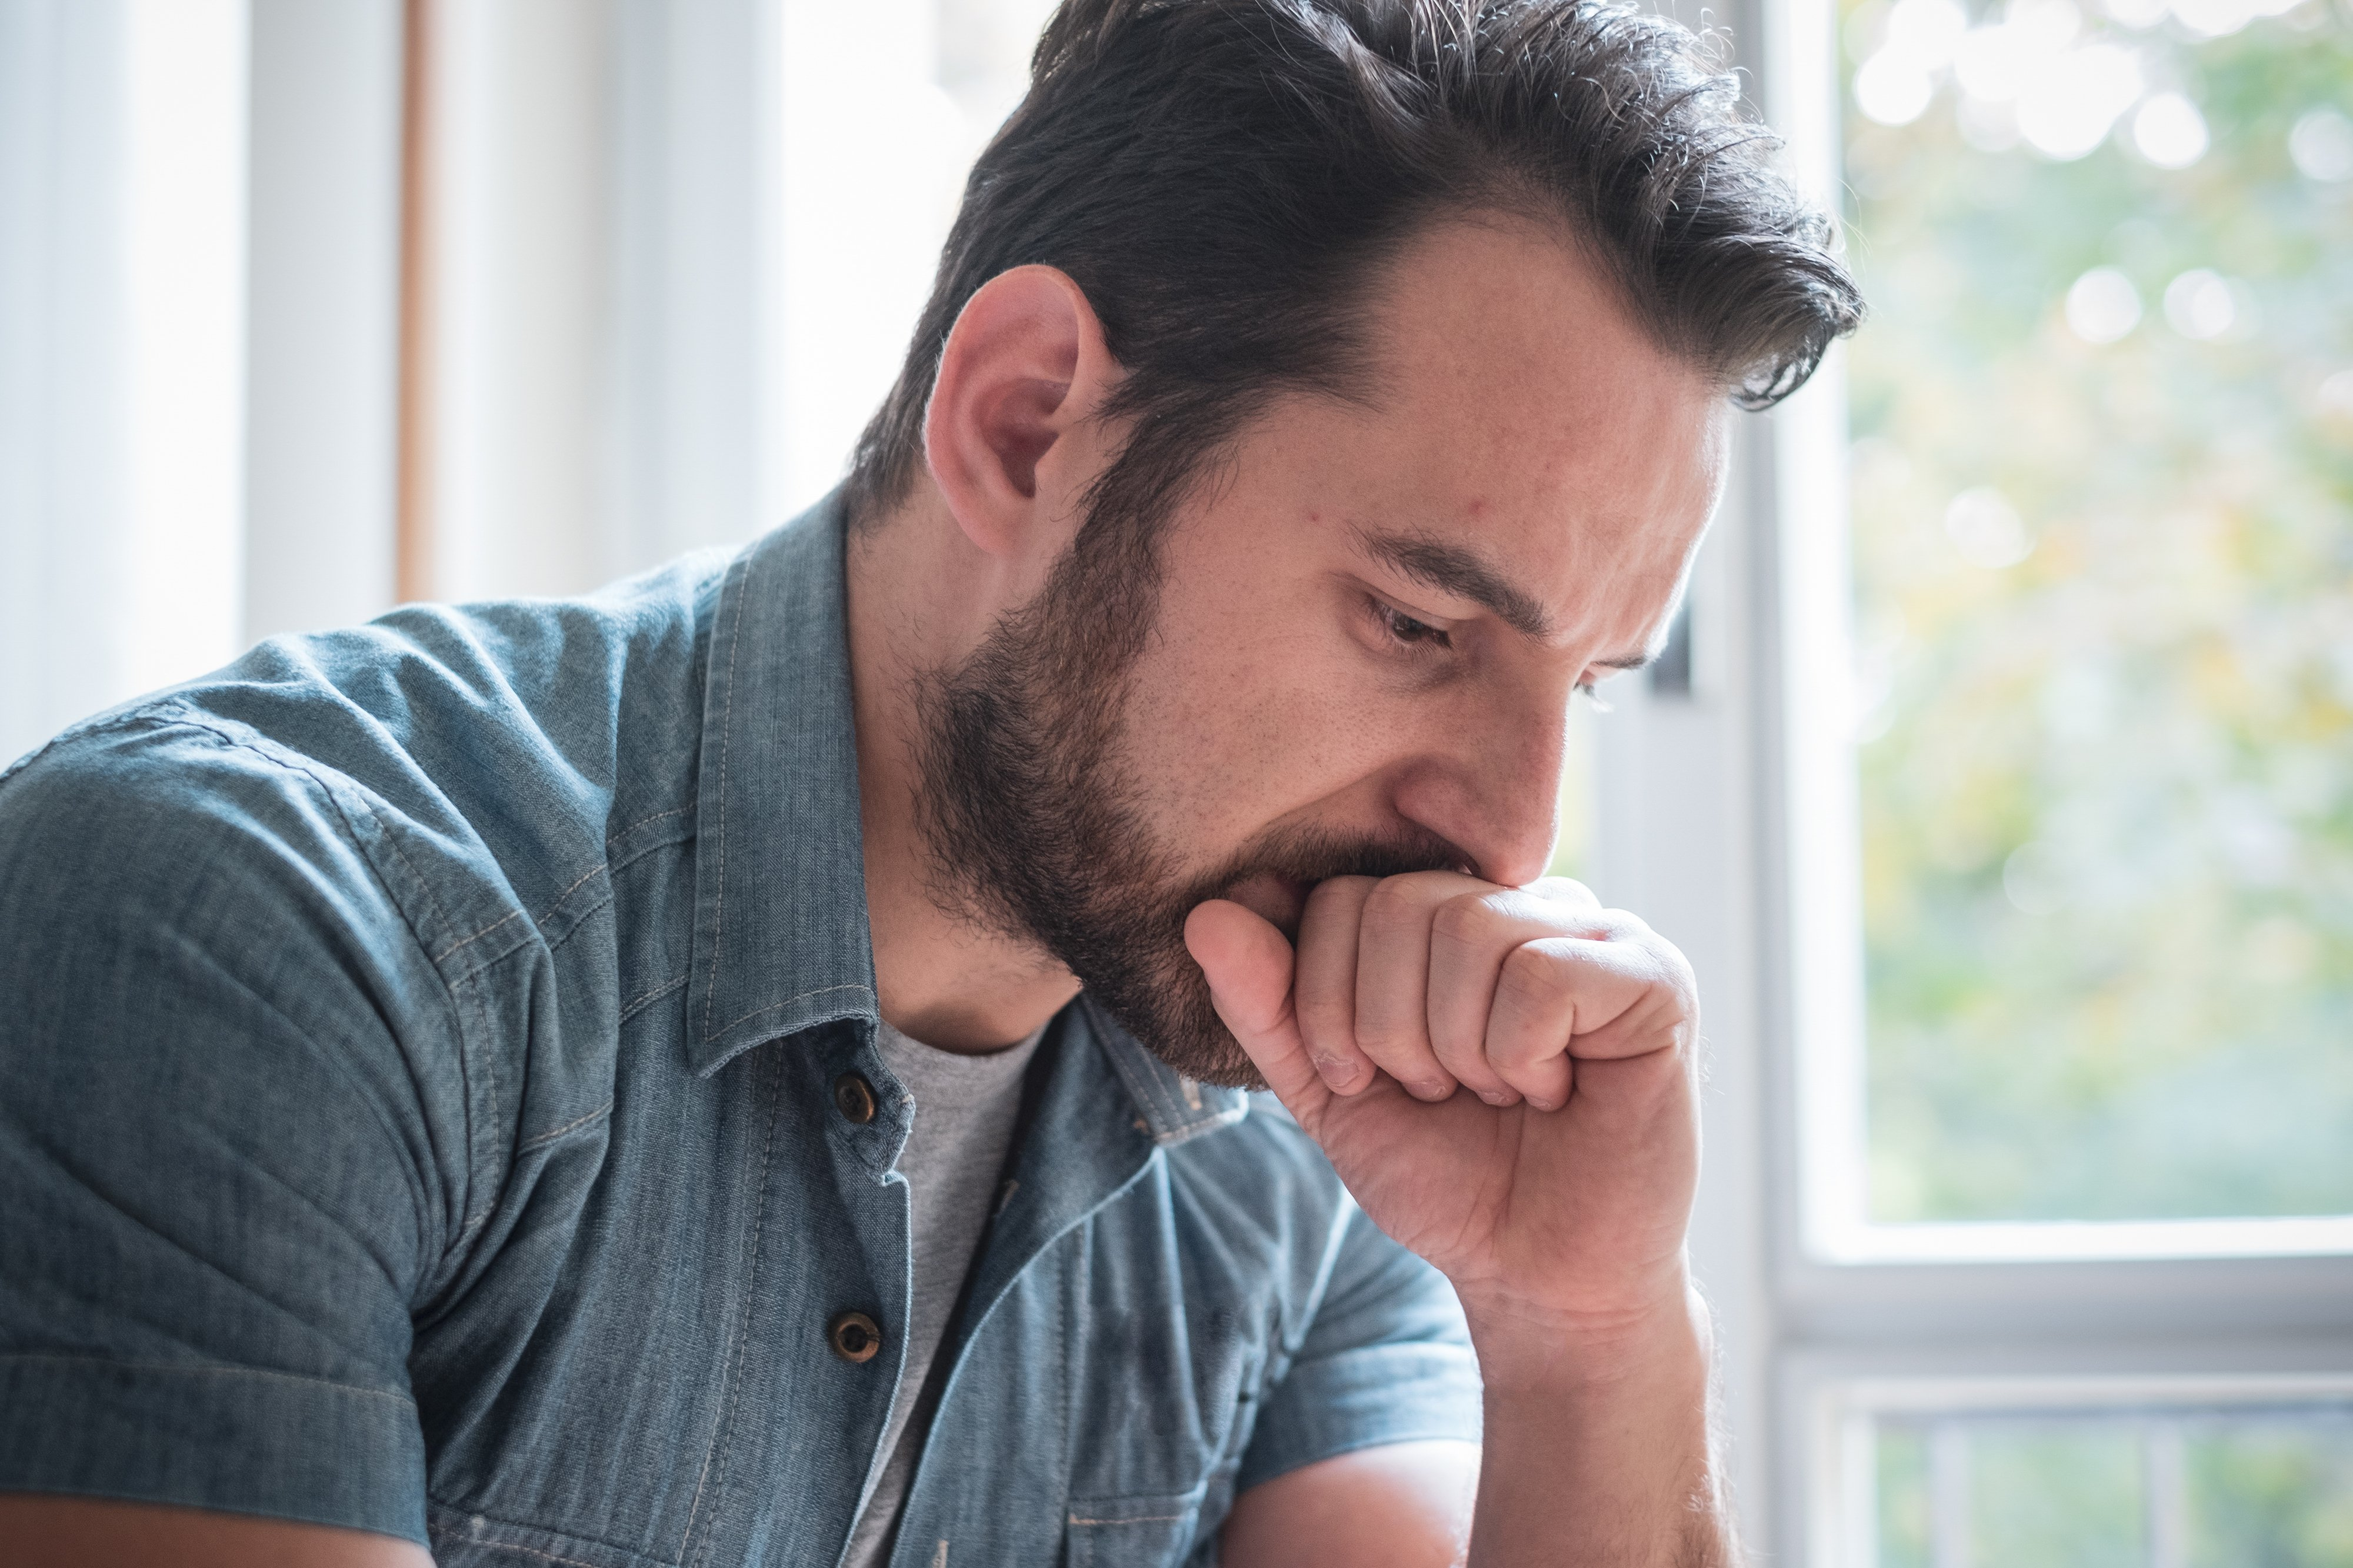 Man in a pensive mood | Photo: Shutterstock.com